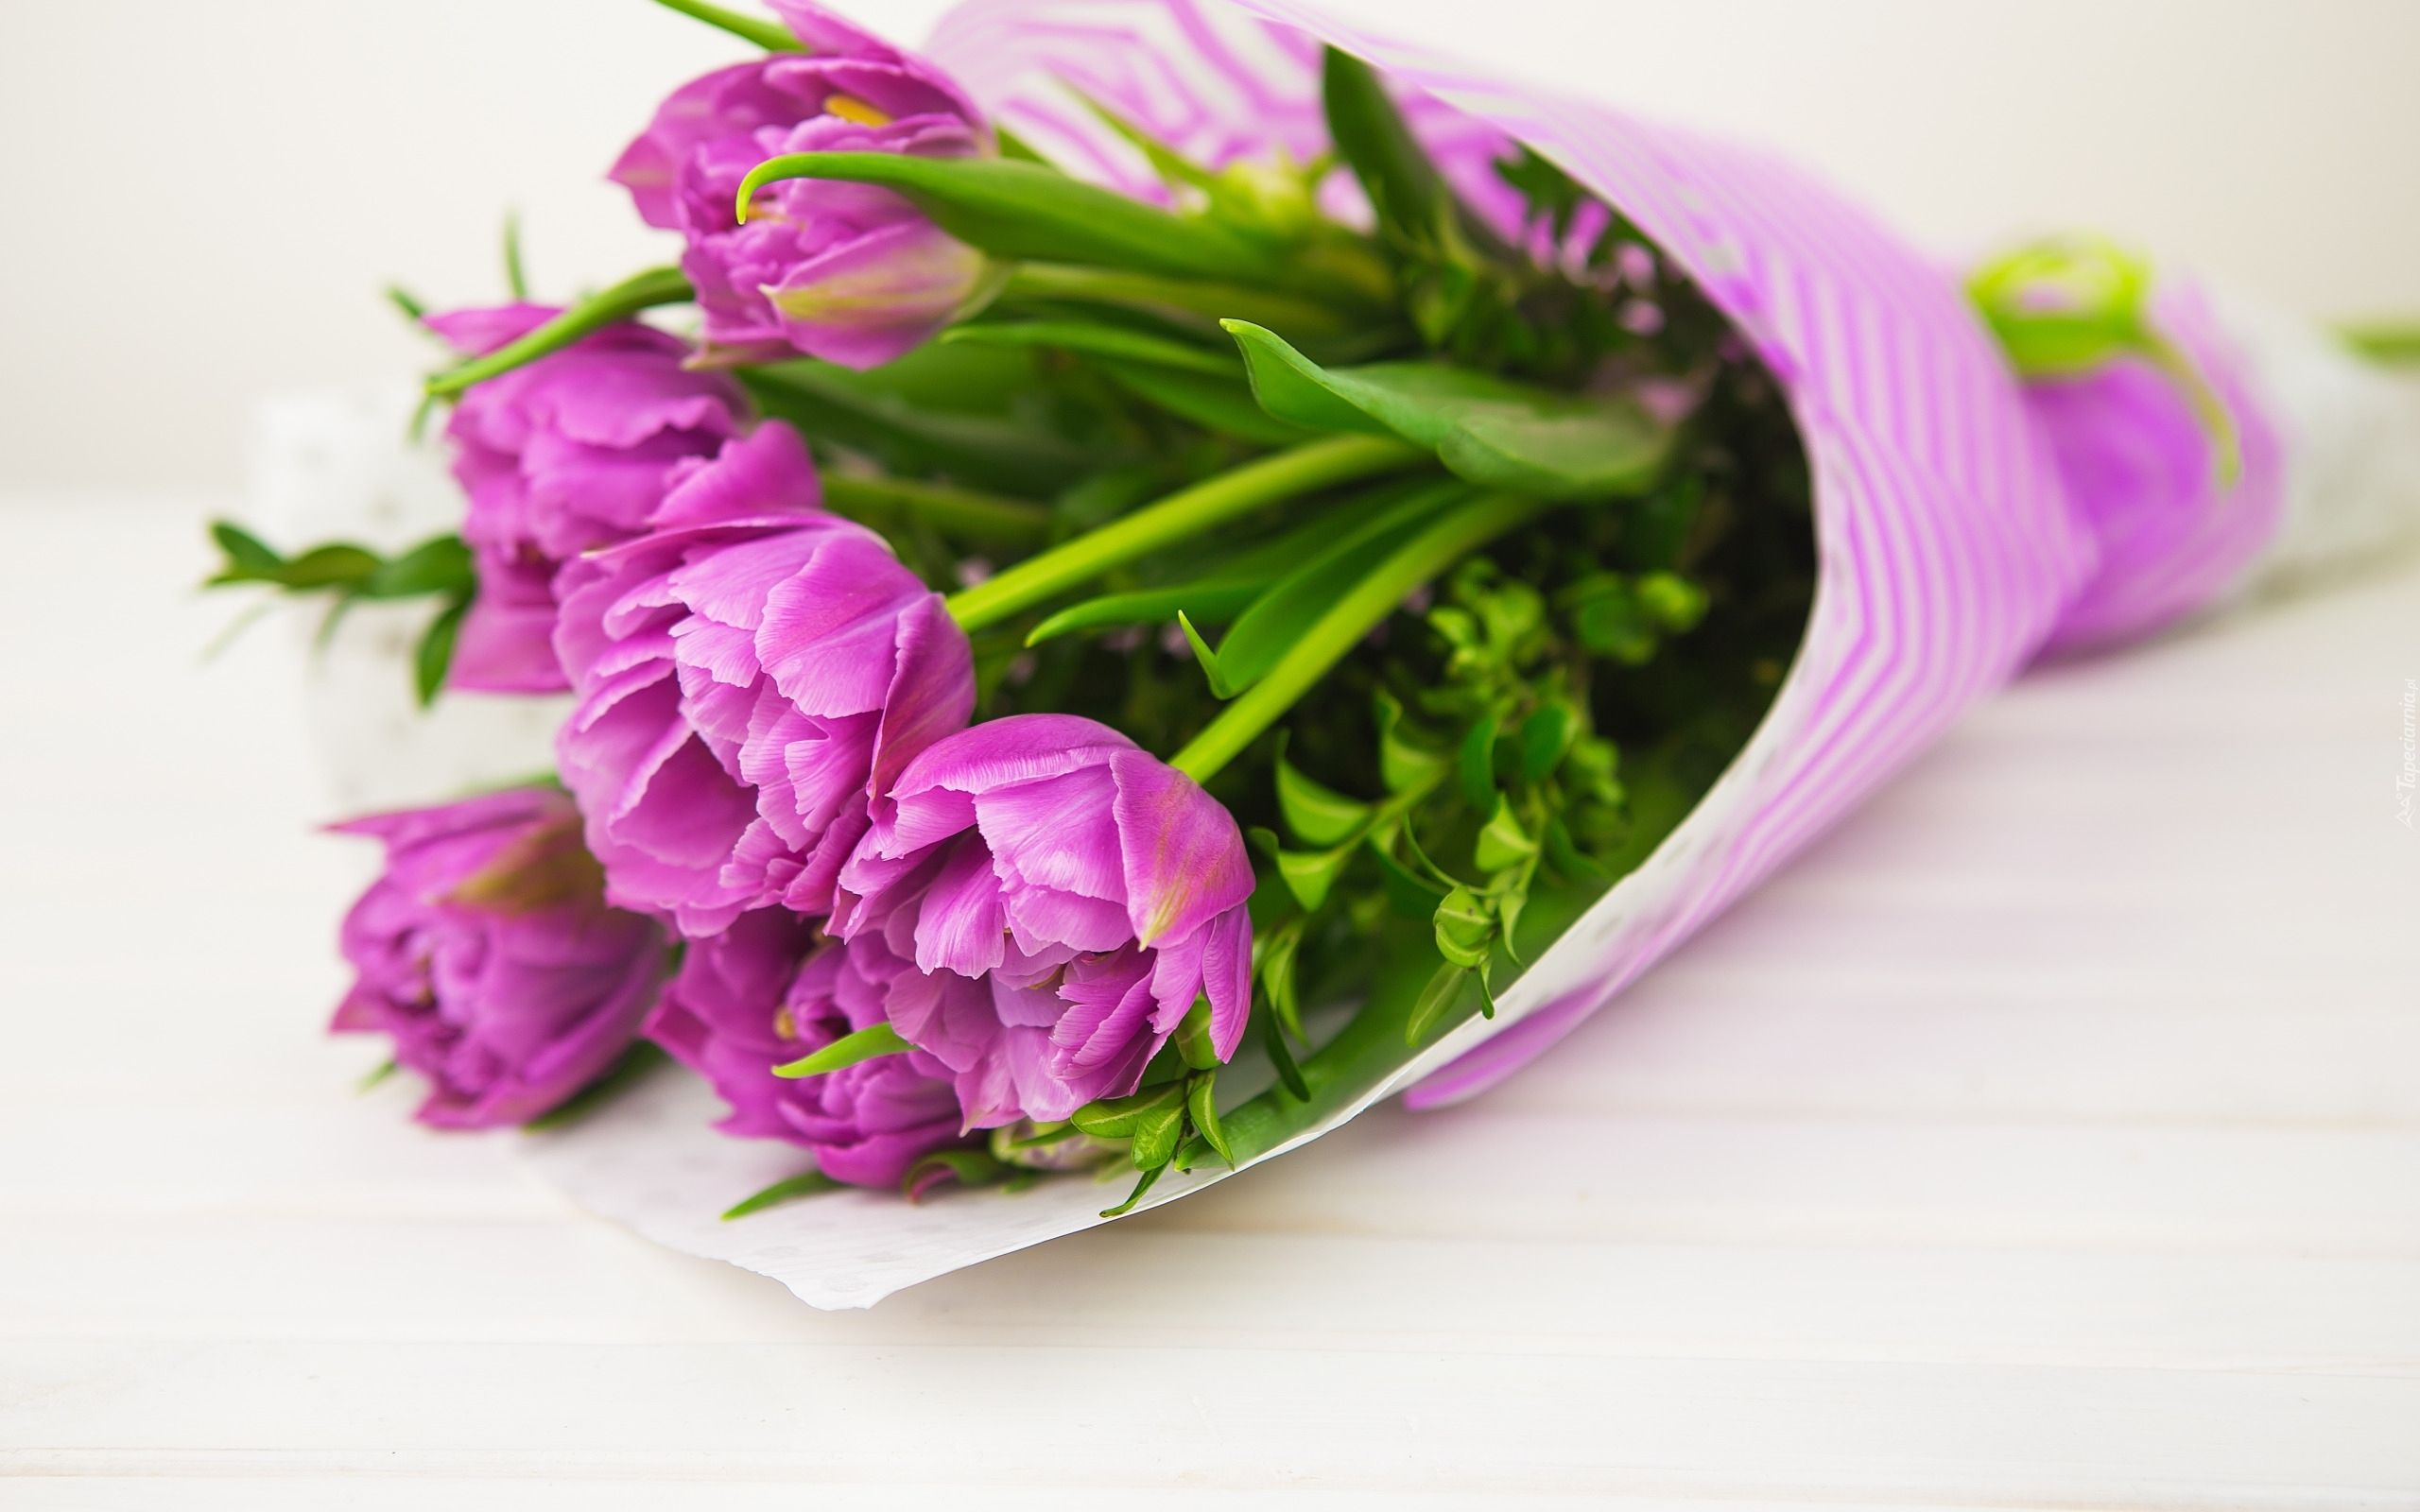 Tulipany Kwiaty Bukiet Piekne Tapety Na Twoj Pulpit Herbs Vegetables Cabbage